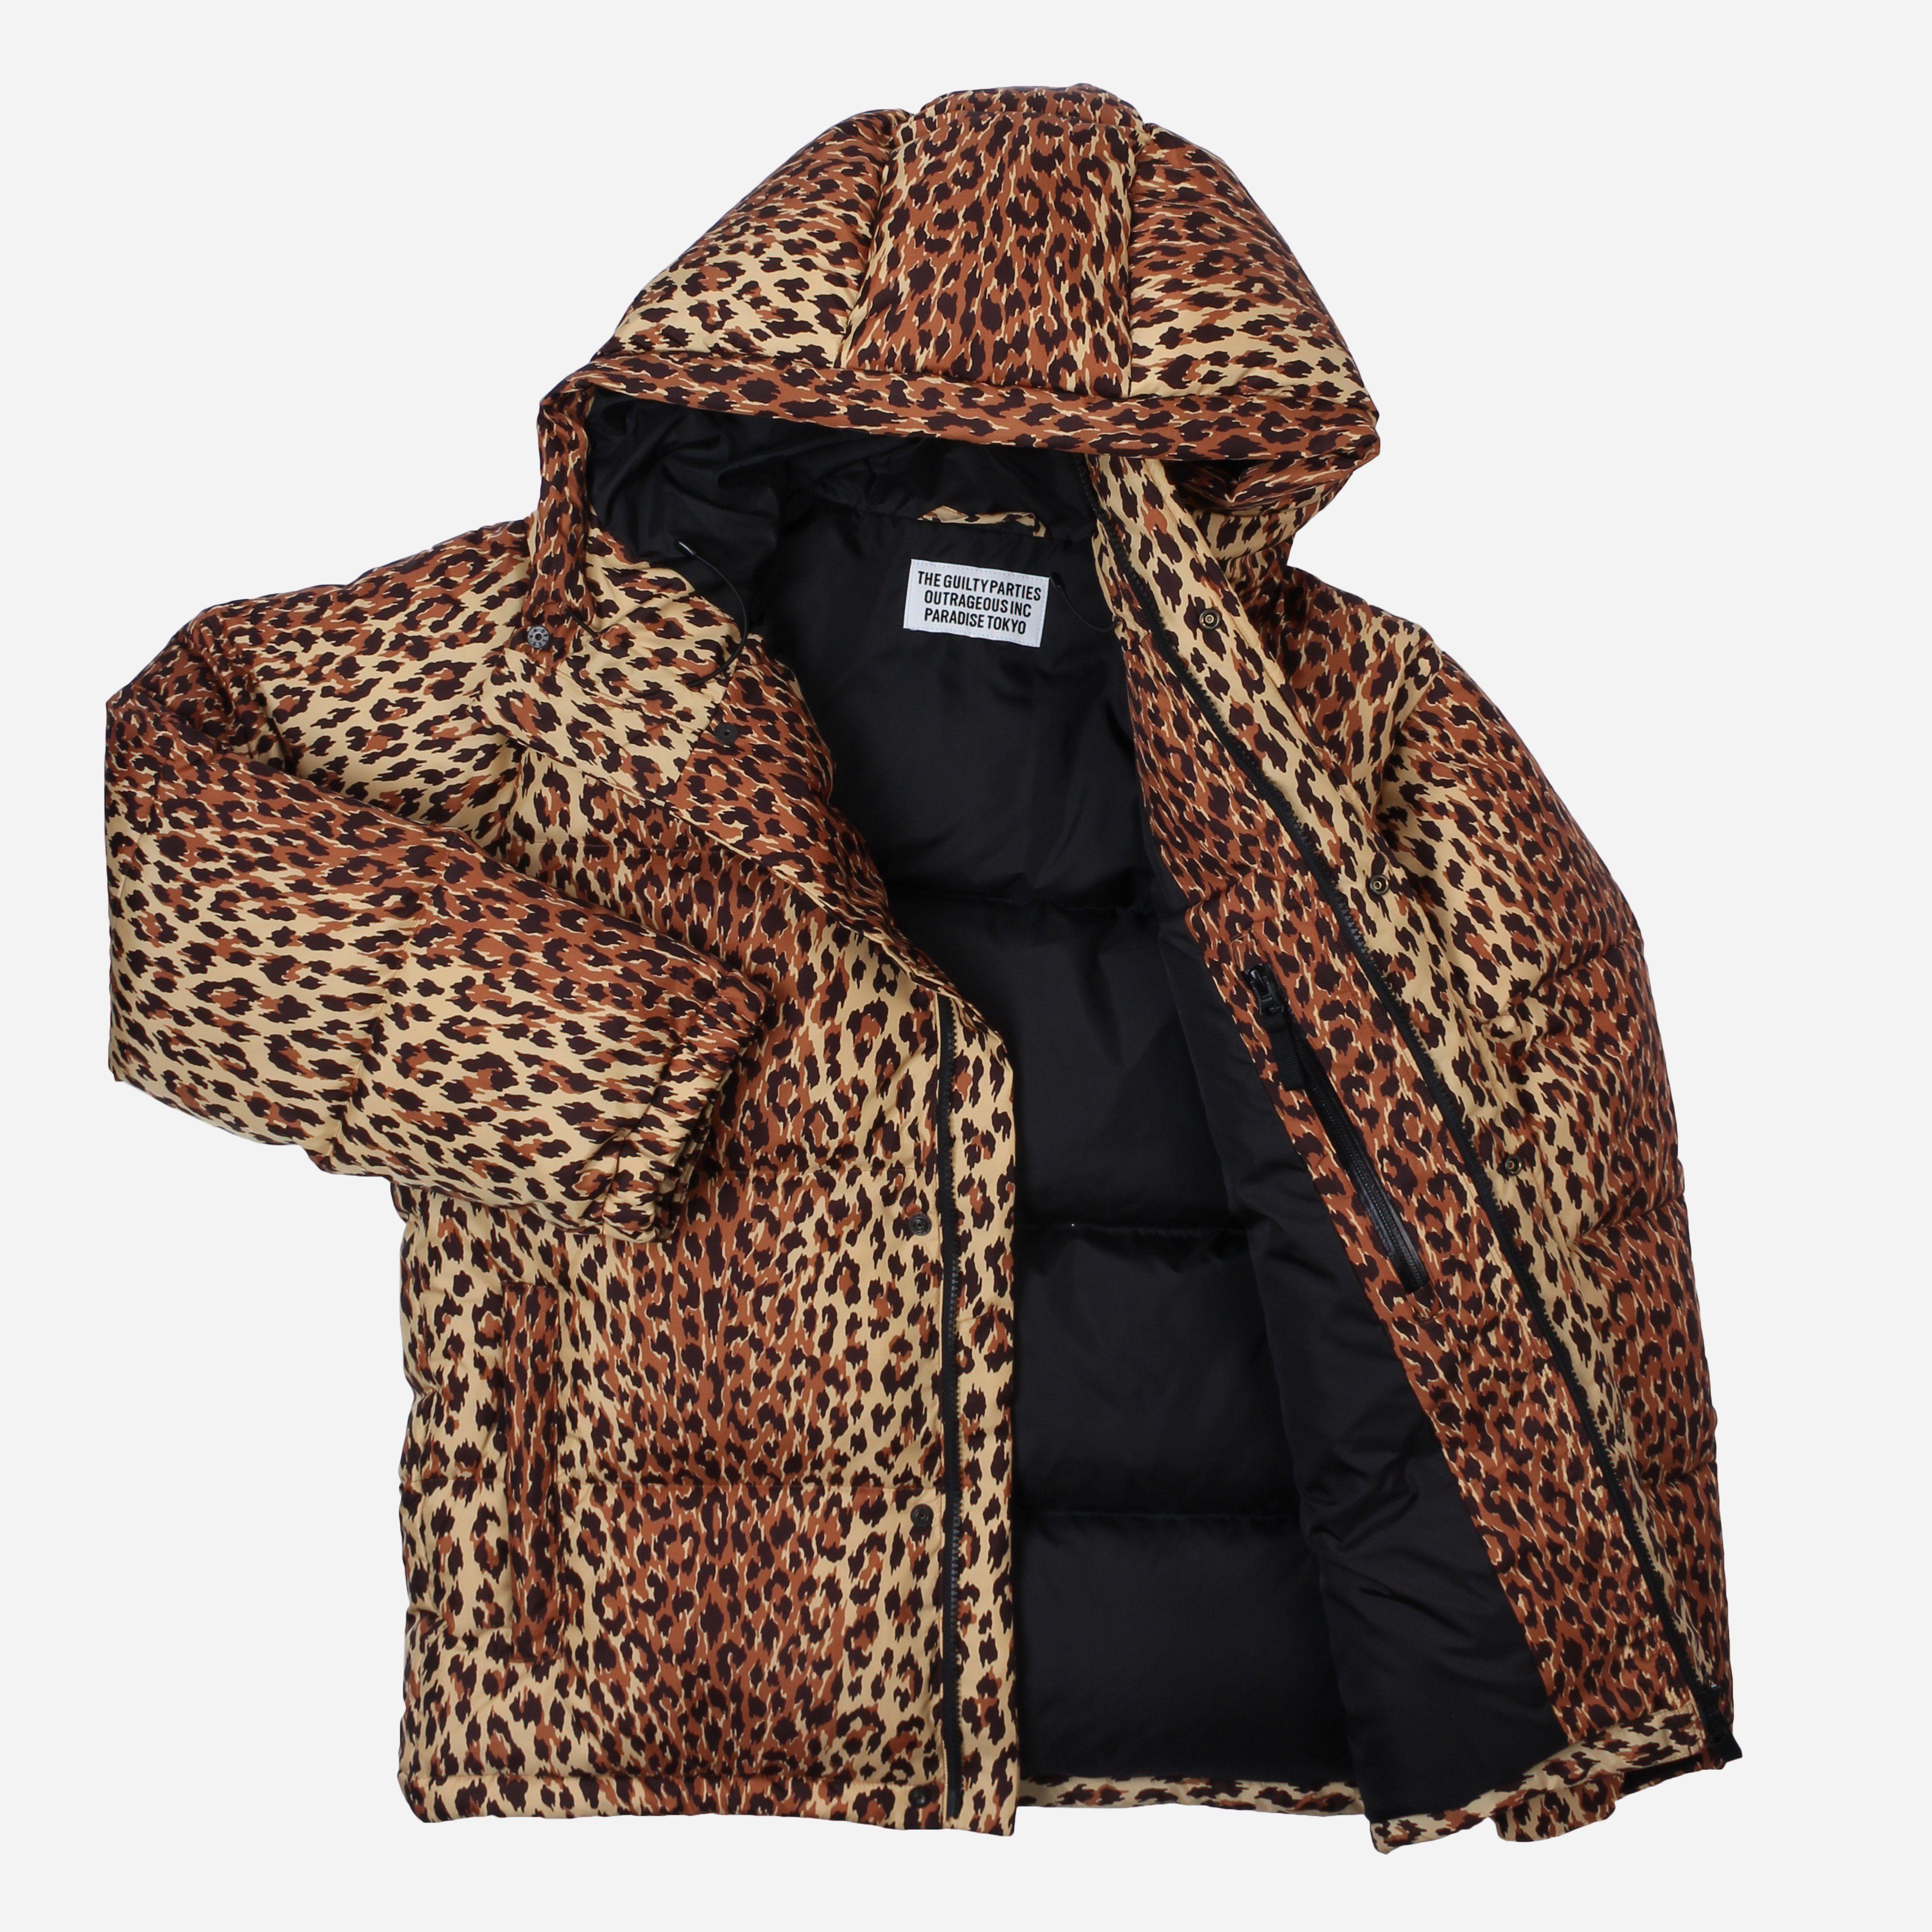 Wacko Maria Hooded Down Jacket Type 1